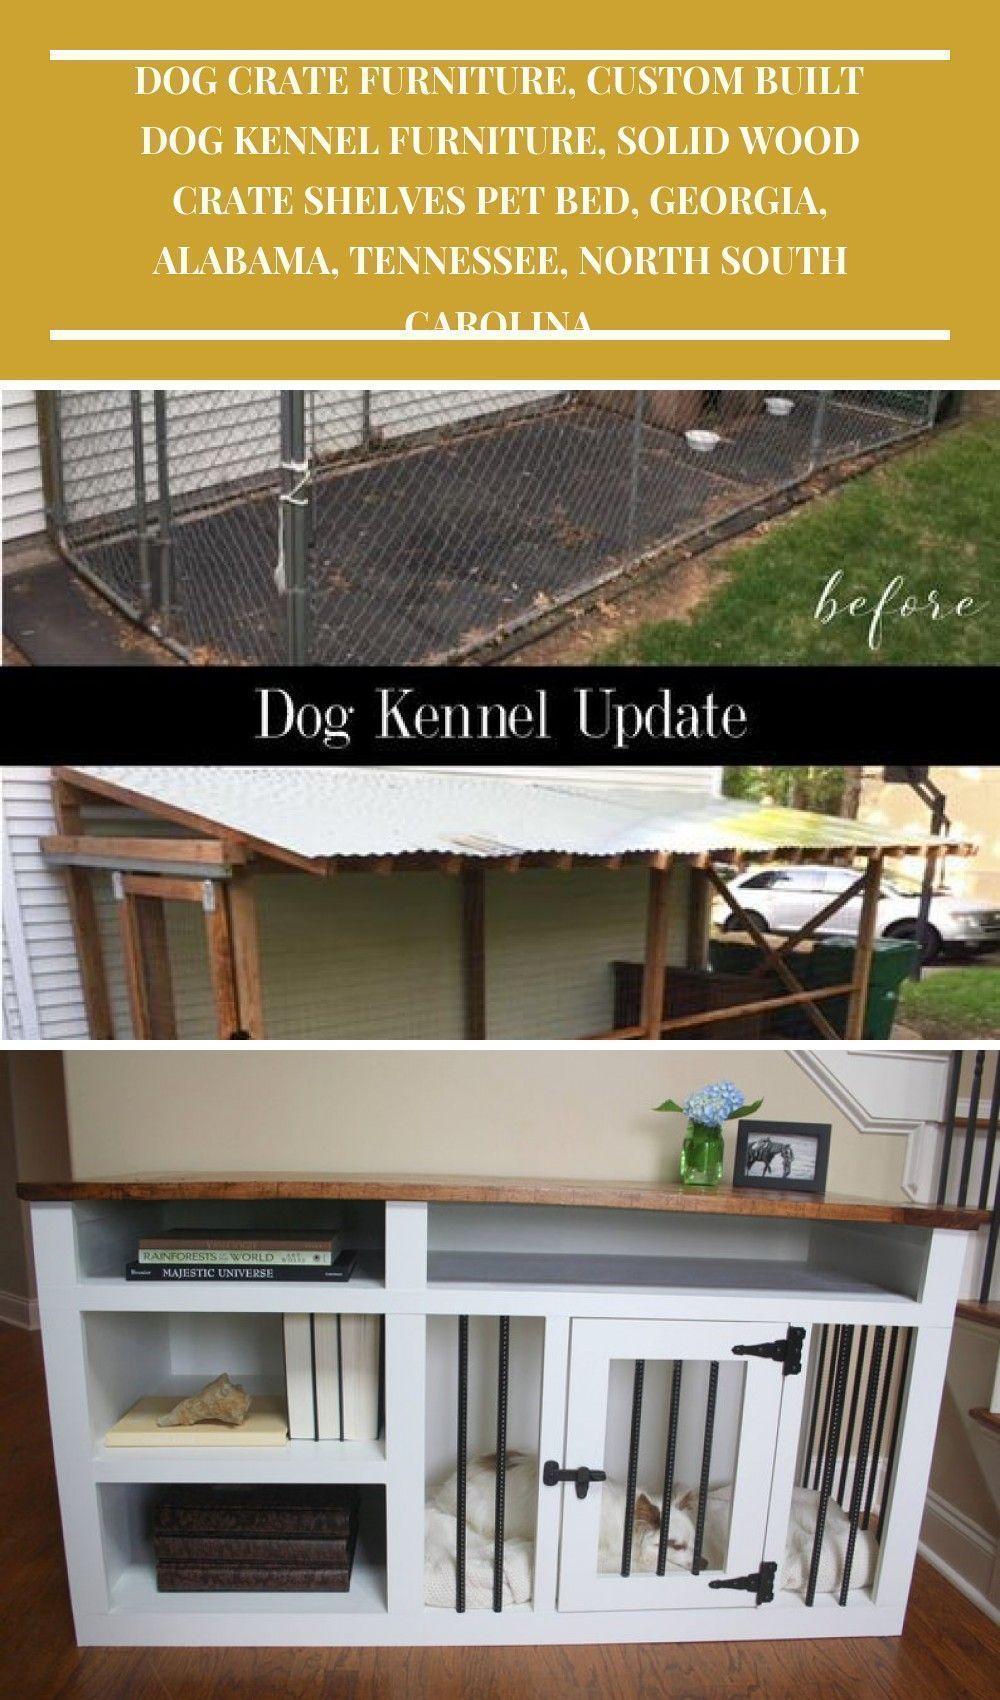 Terrific Pics Custom DIY Outdoor Dog Kennel  Dog Dog Kennel with roof  Kennel Terrific  Terrific Pics Custom DIY Outdoor Dog Kennel  Dog Dog Kennel with roof  Kennel Terr...